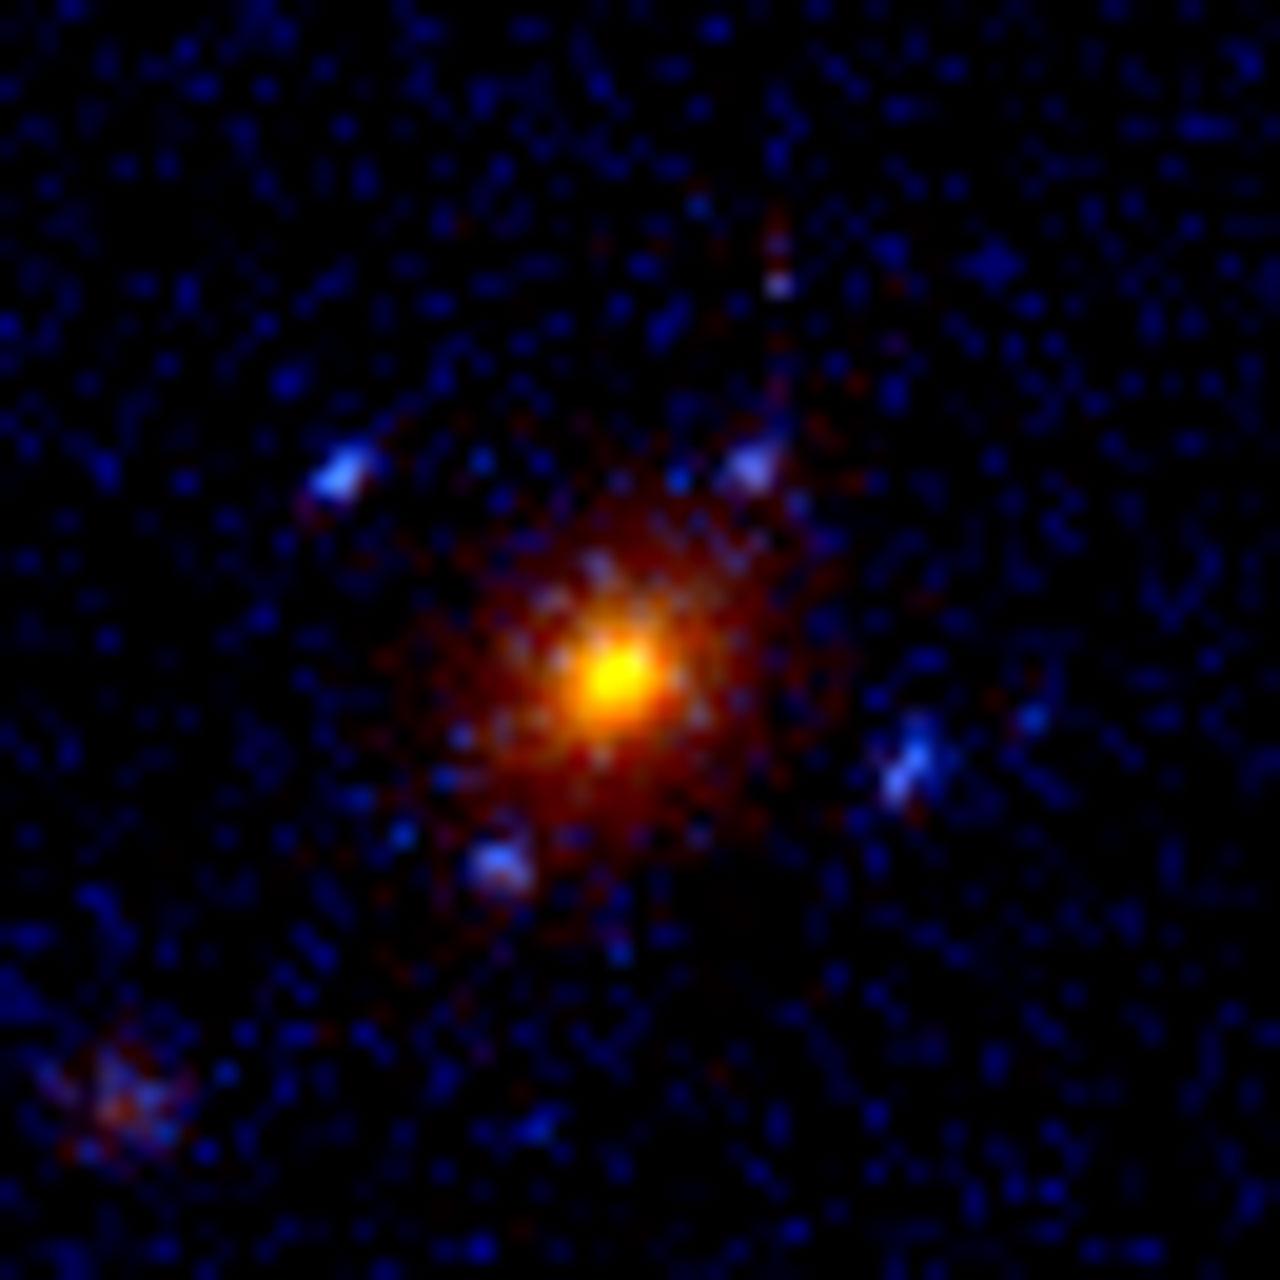 Hubble's Top Ten Gravitational Lenses. A View of HST 14176 ...